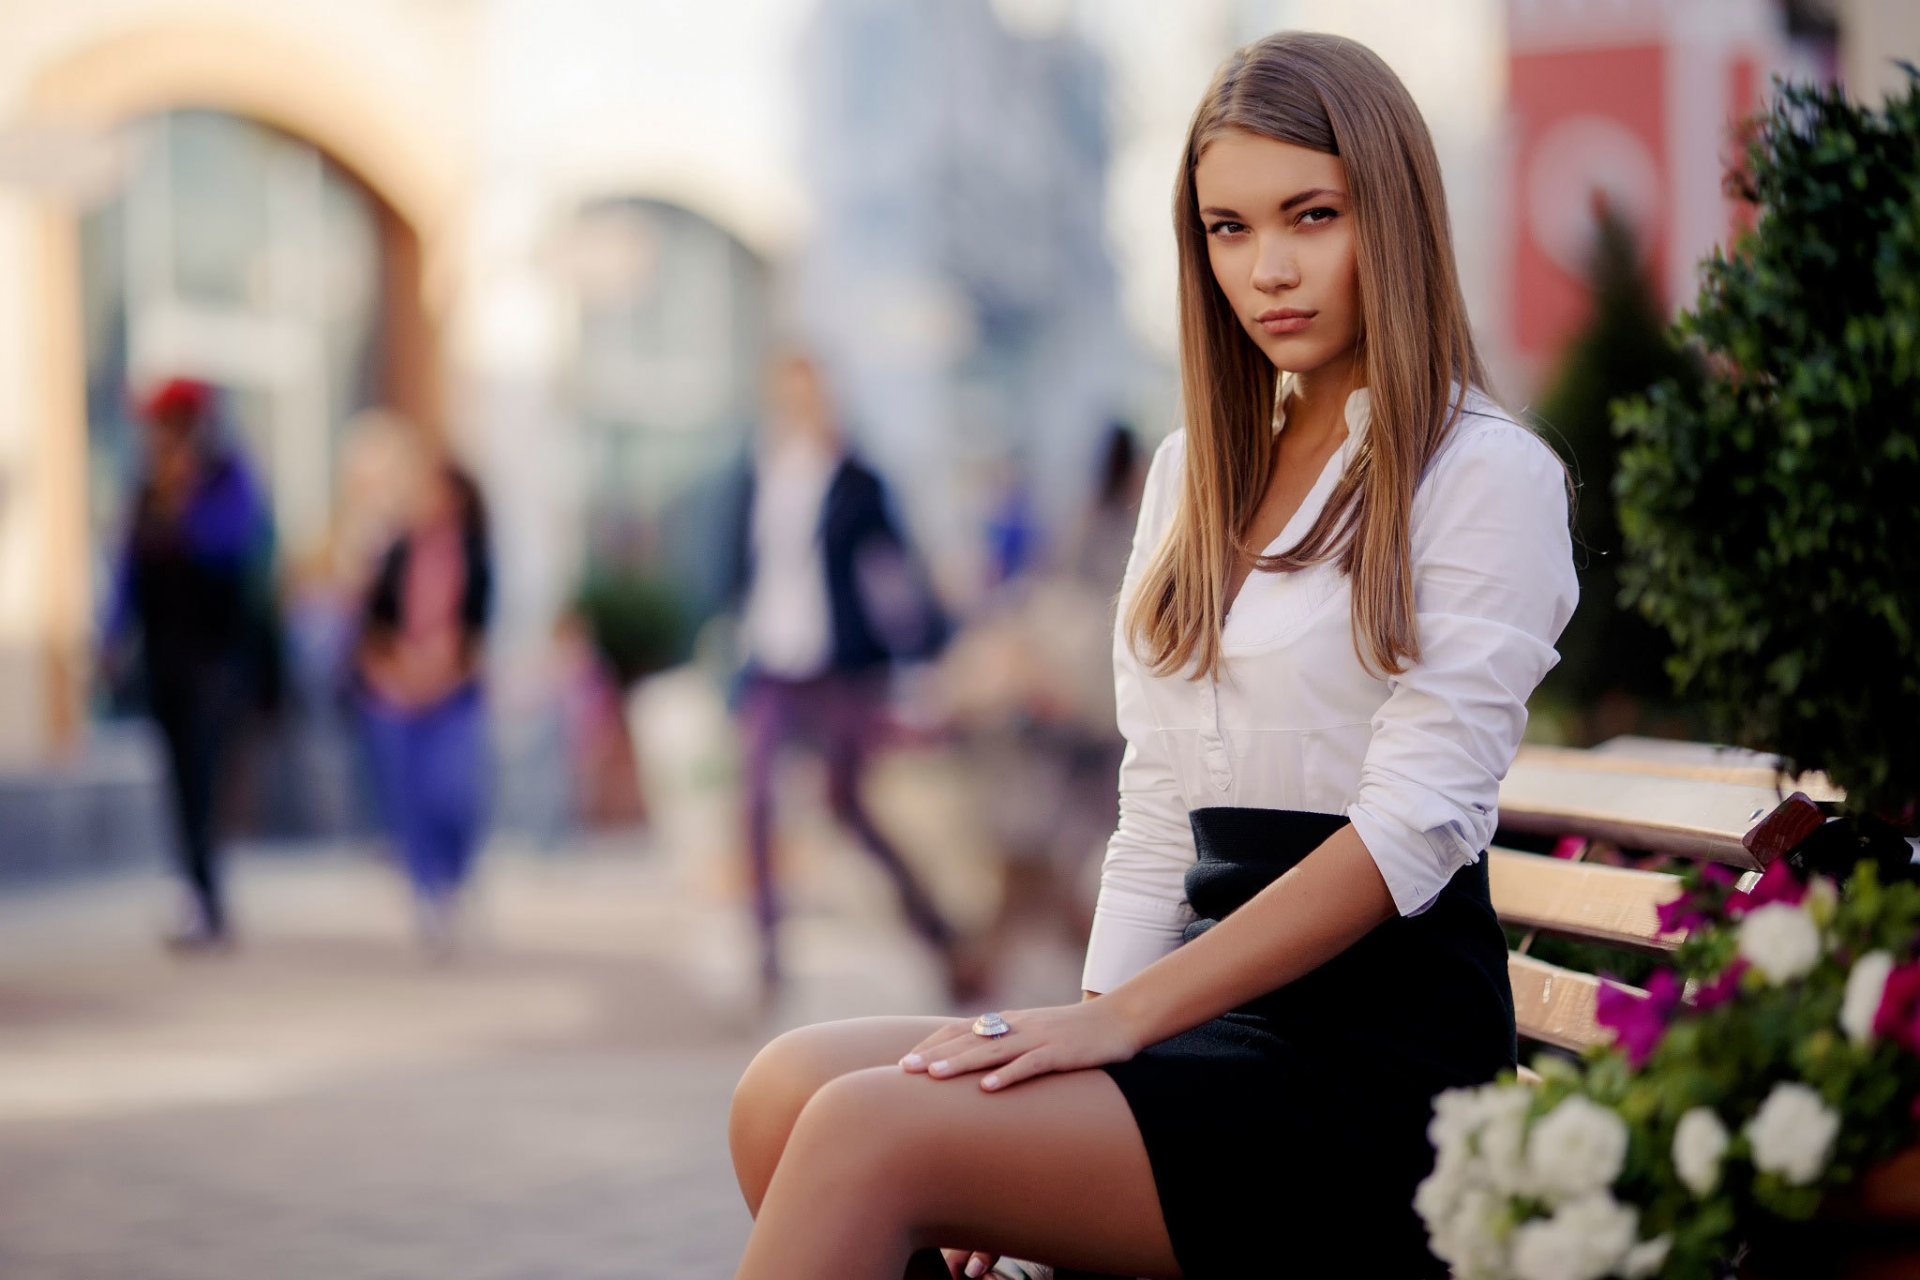 Красивая девушка на улице онлайн